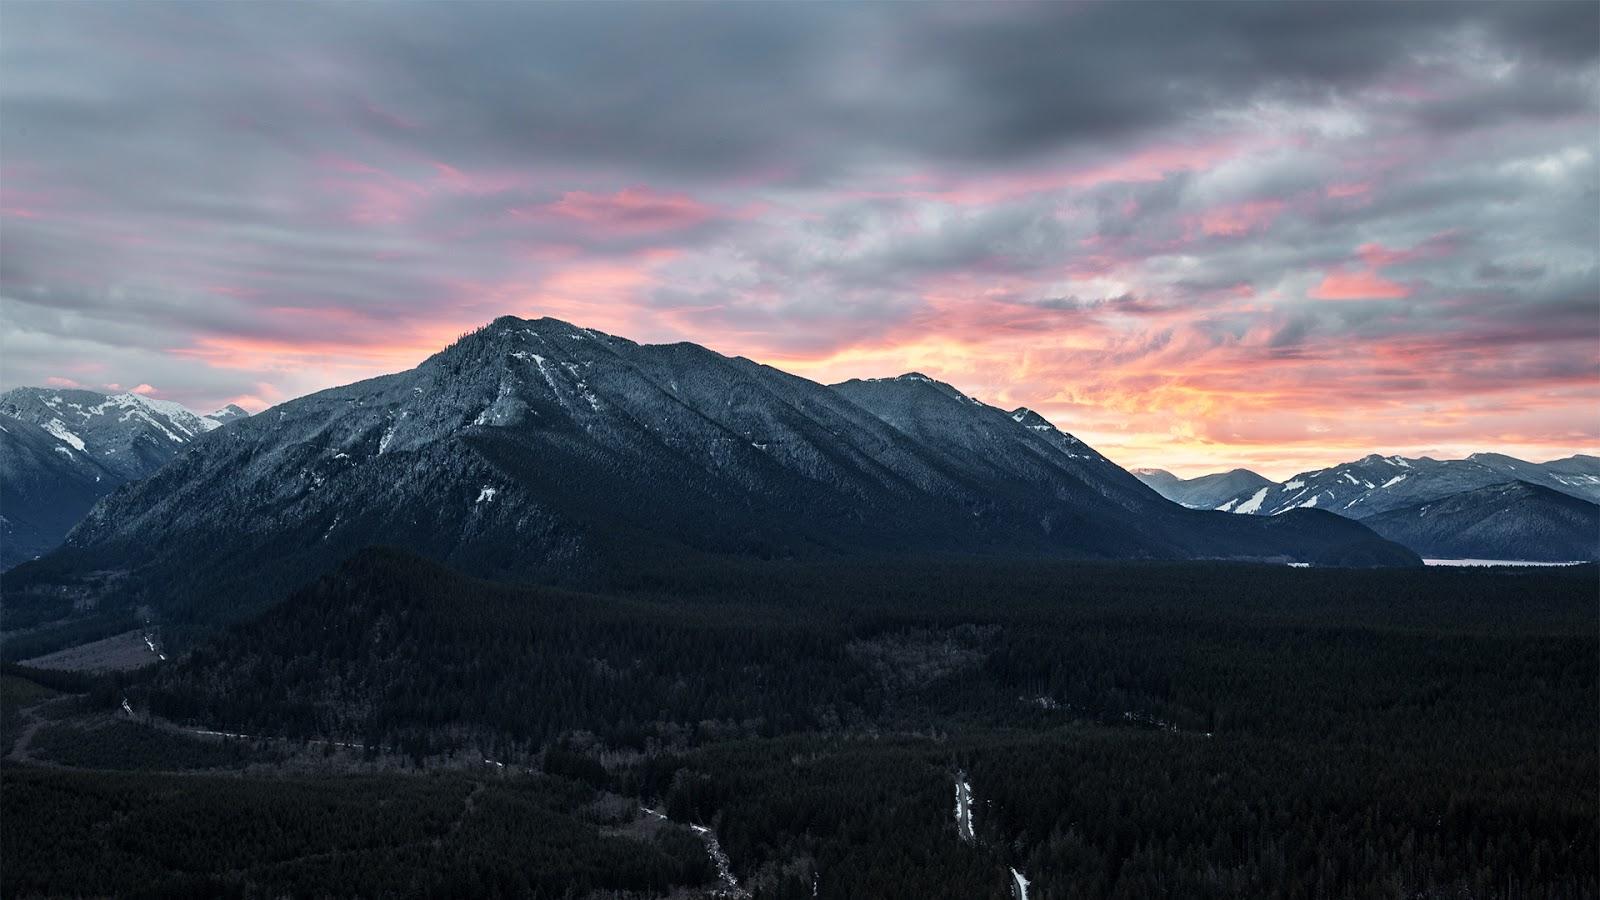 Пейзаж: гора и закат